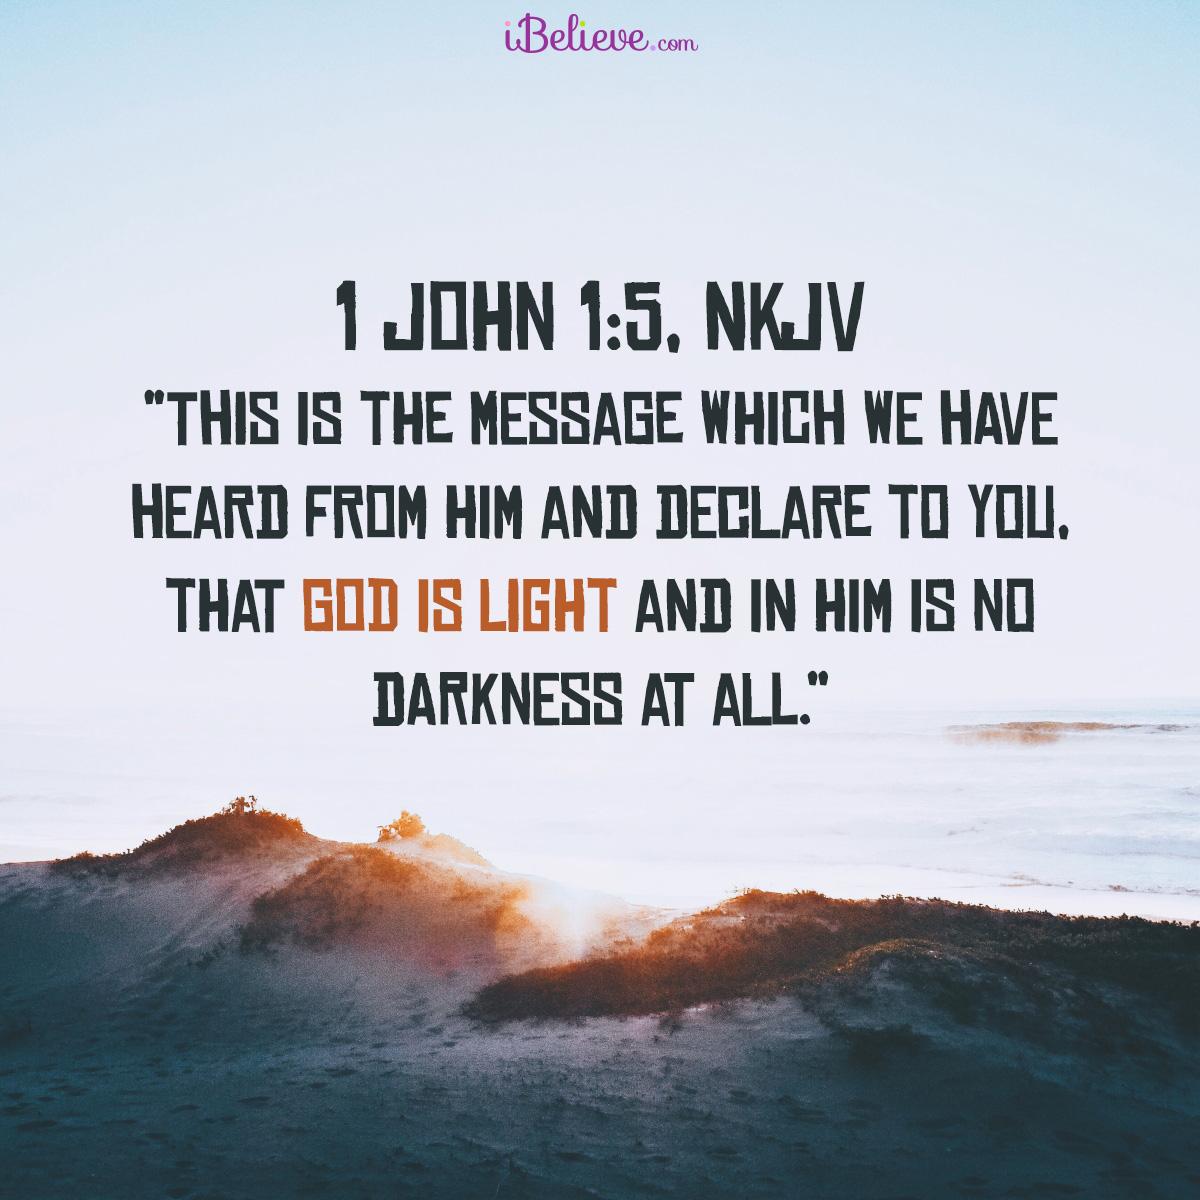 Inspirational Image of 1 John 1:5